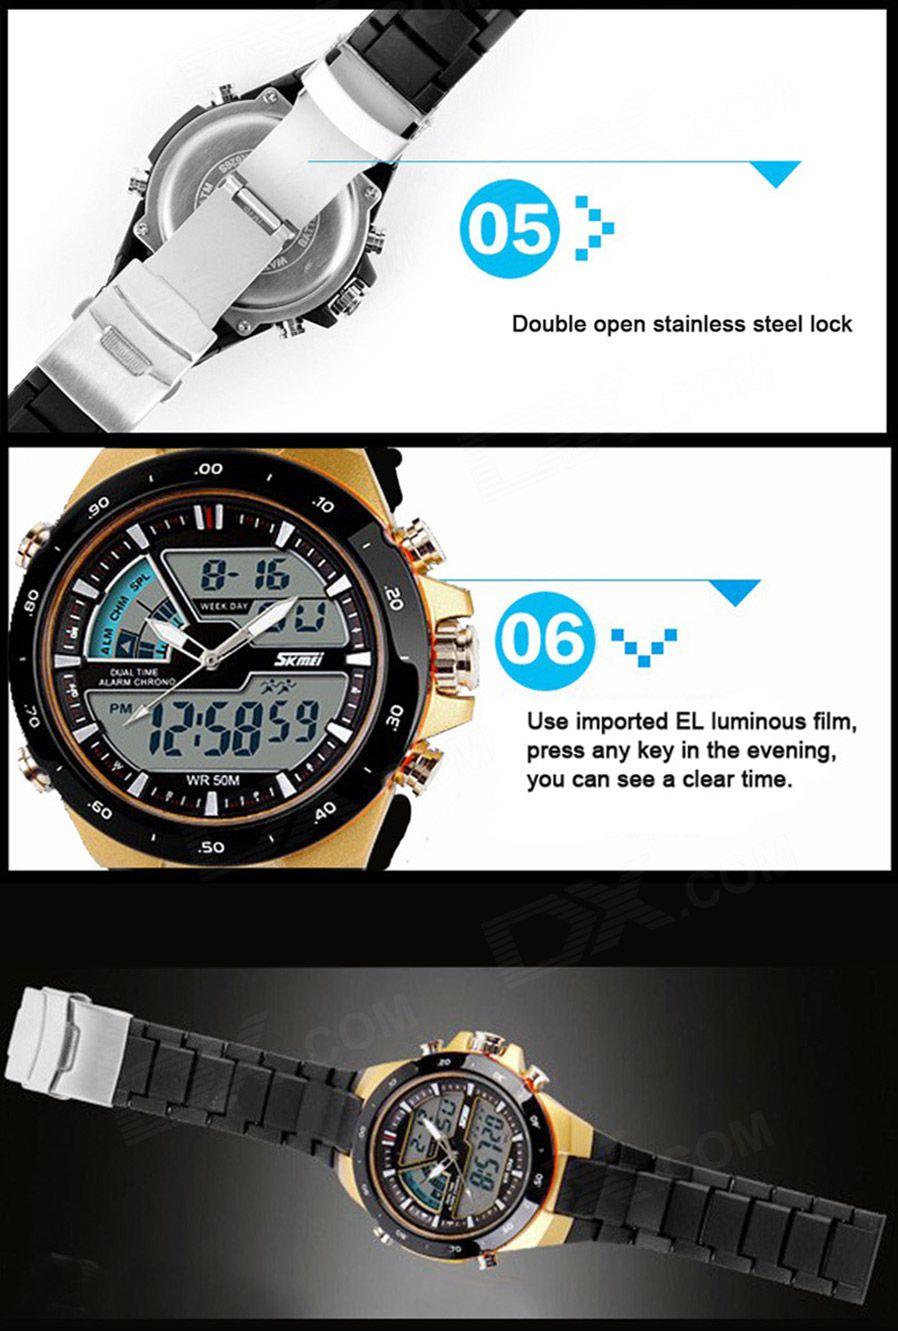 skmei 1016 men s waterproof analog digital watch black skmei 1016 50m waterproof led pointer dual mode display men s sports watch black